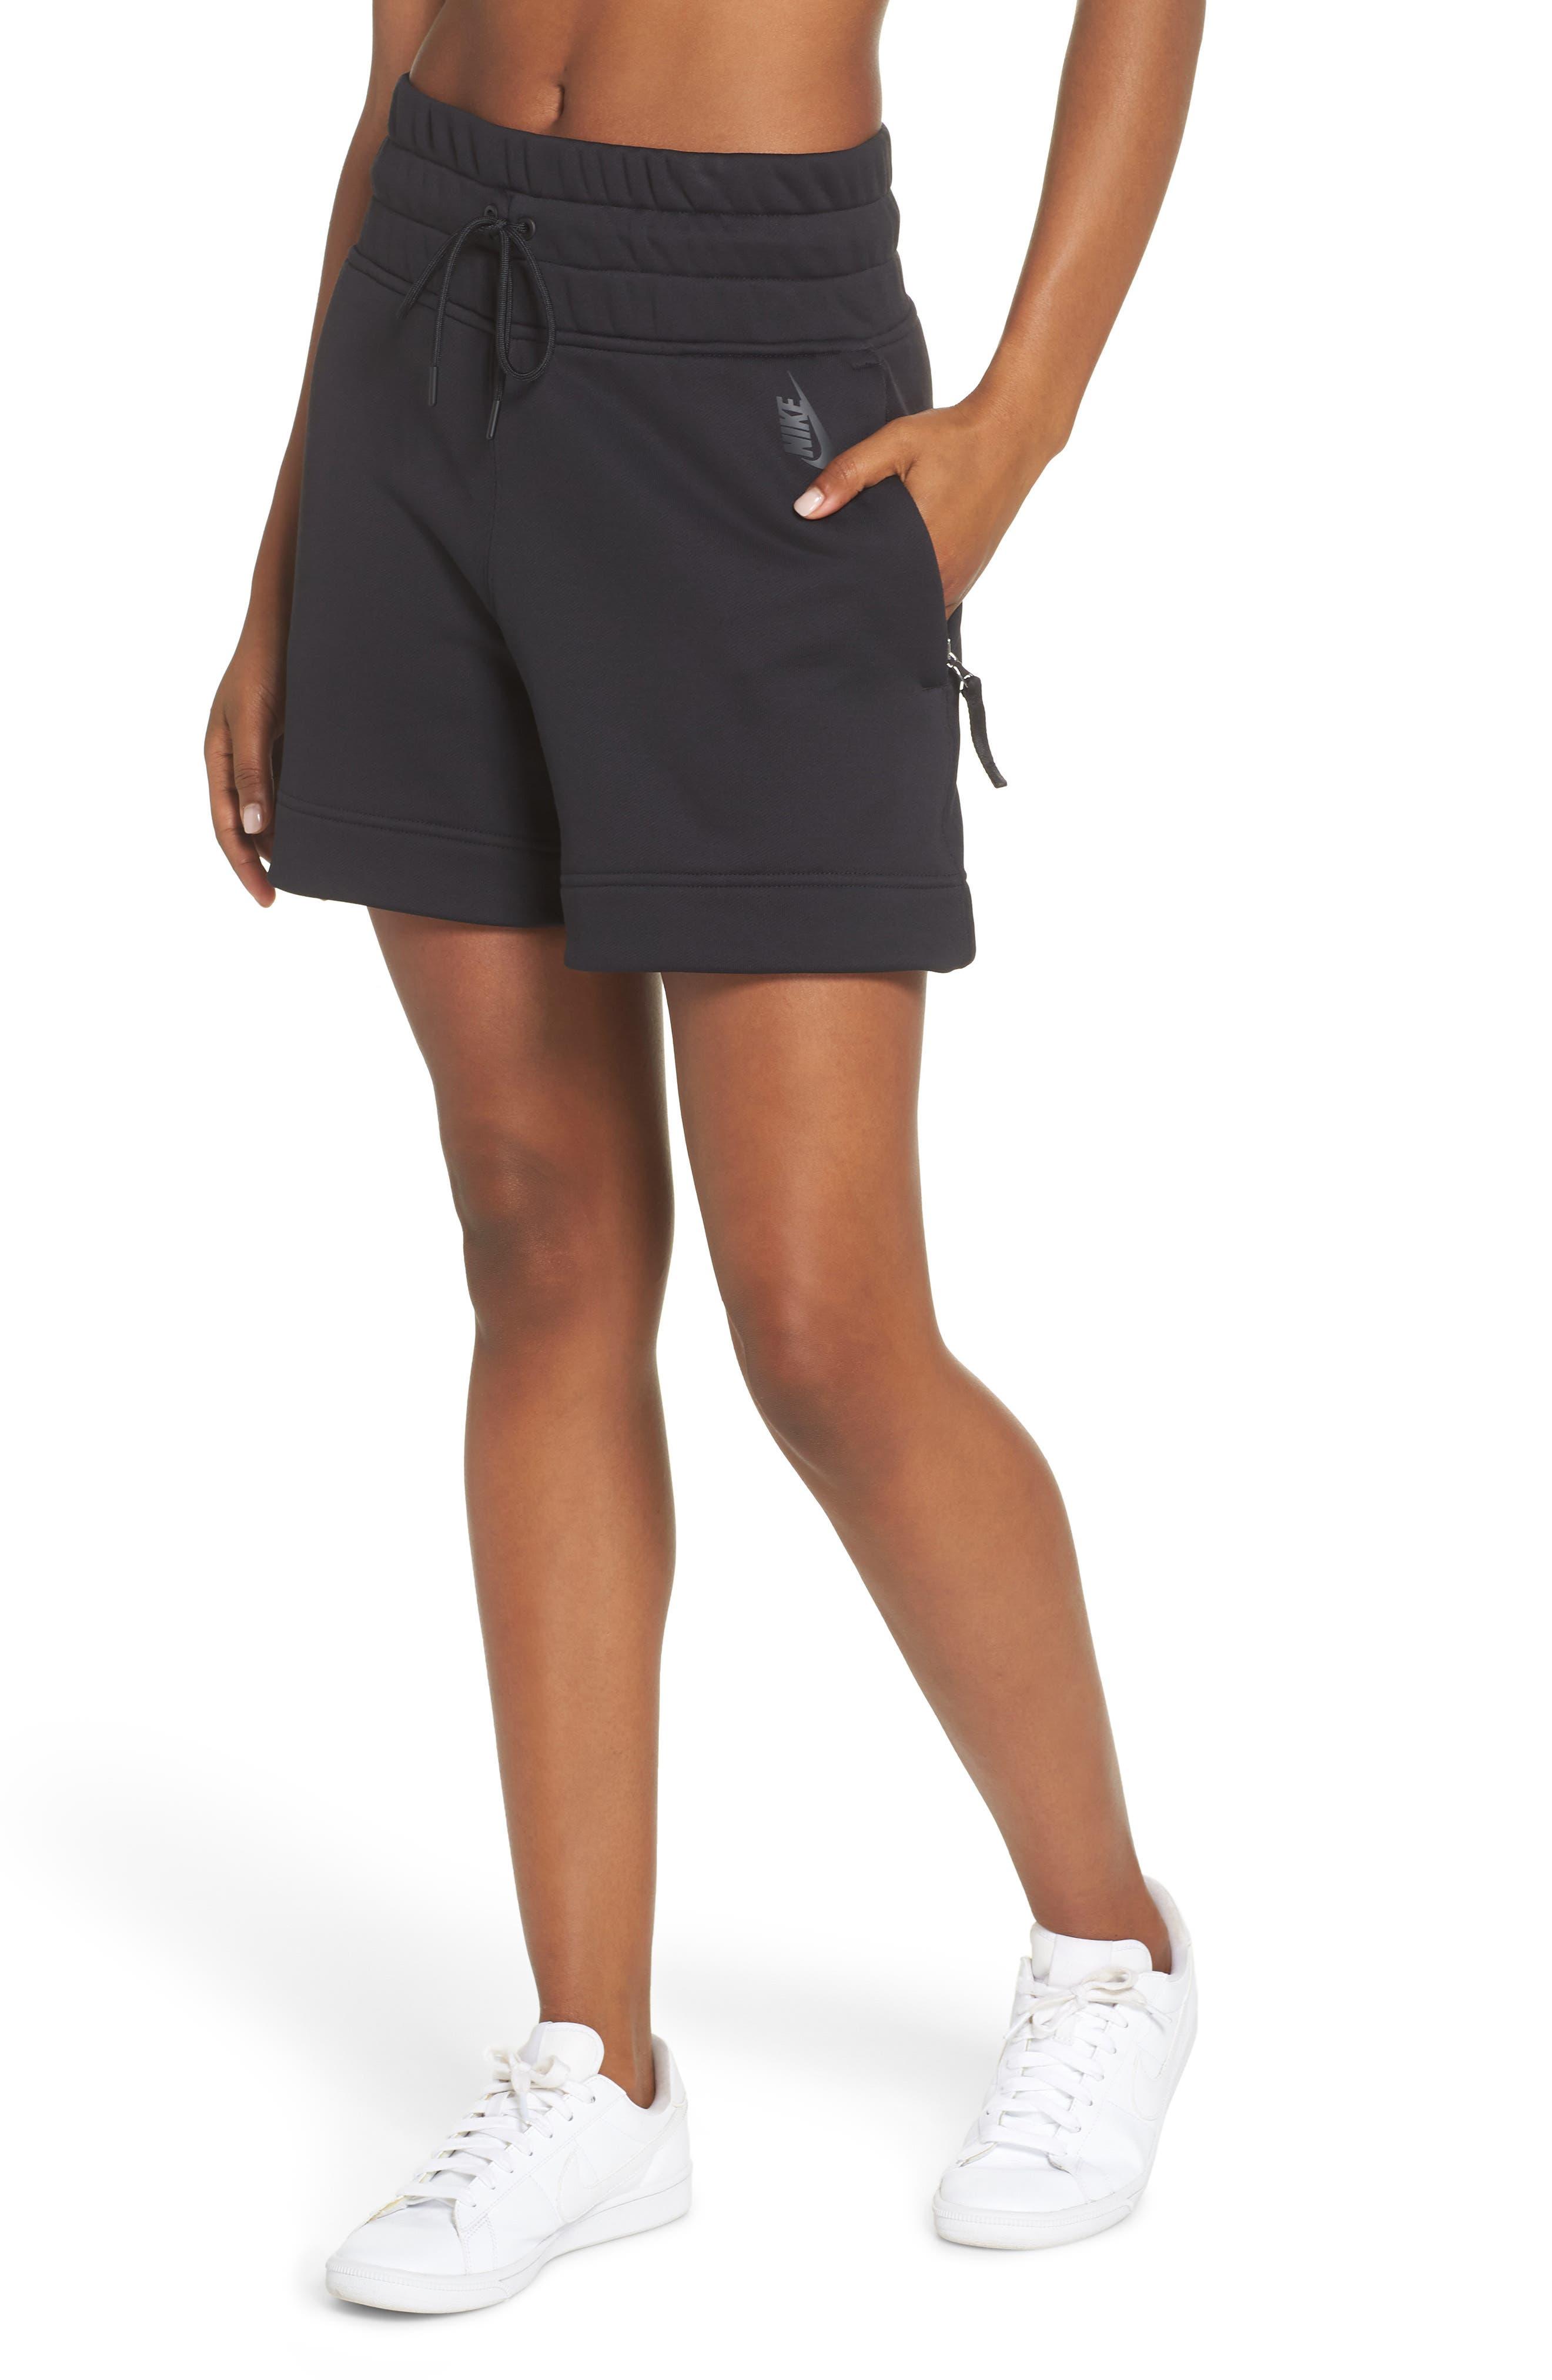 NikeLab Collection Women's Fleece Shorts,                         Main,                         color, BLACK/ BLACK